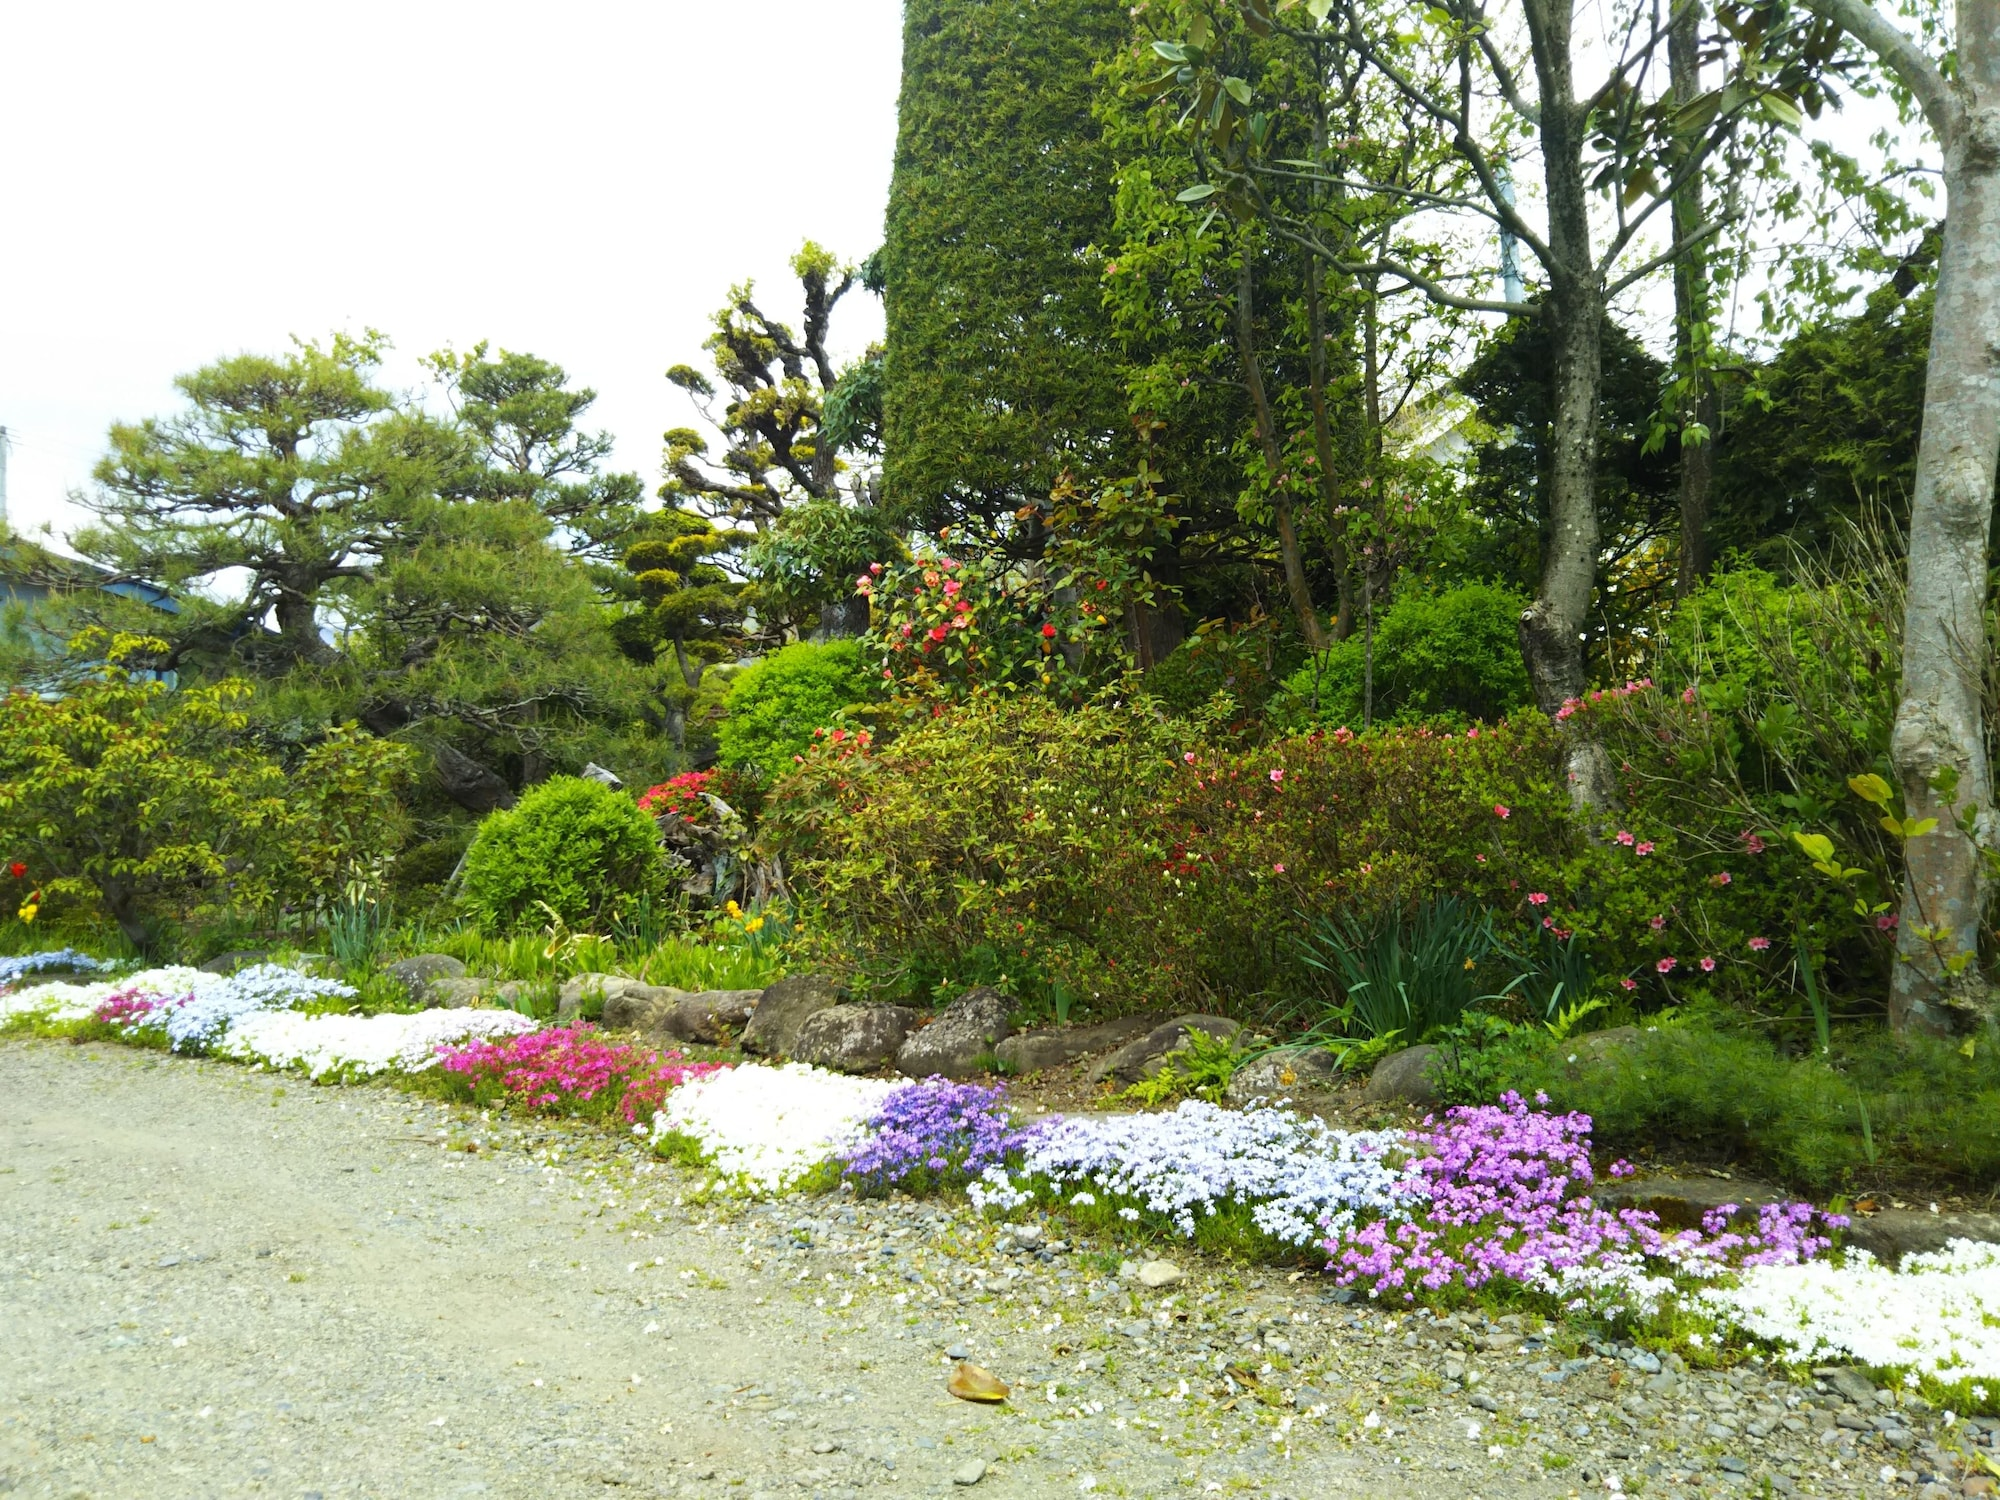 Guesthouse Nashimotoken, Takayama